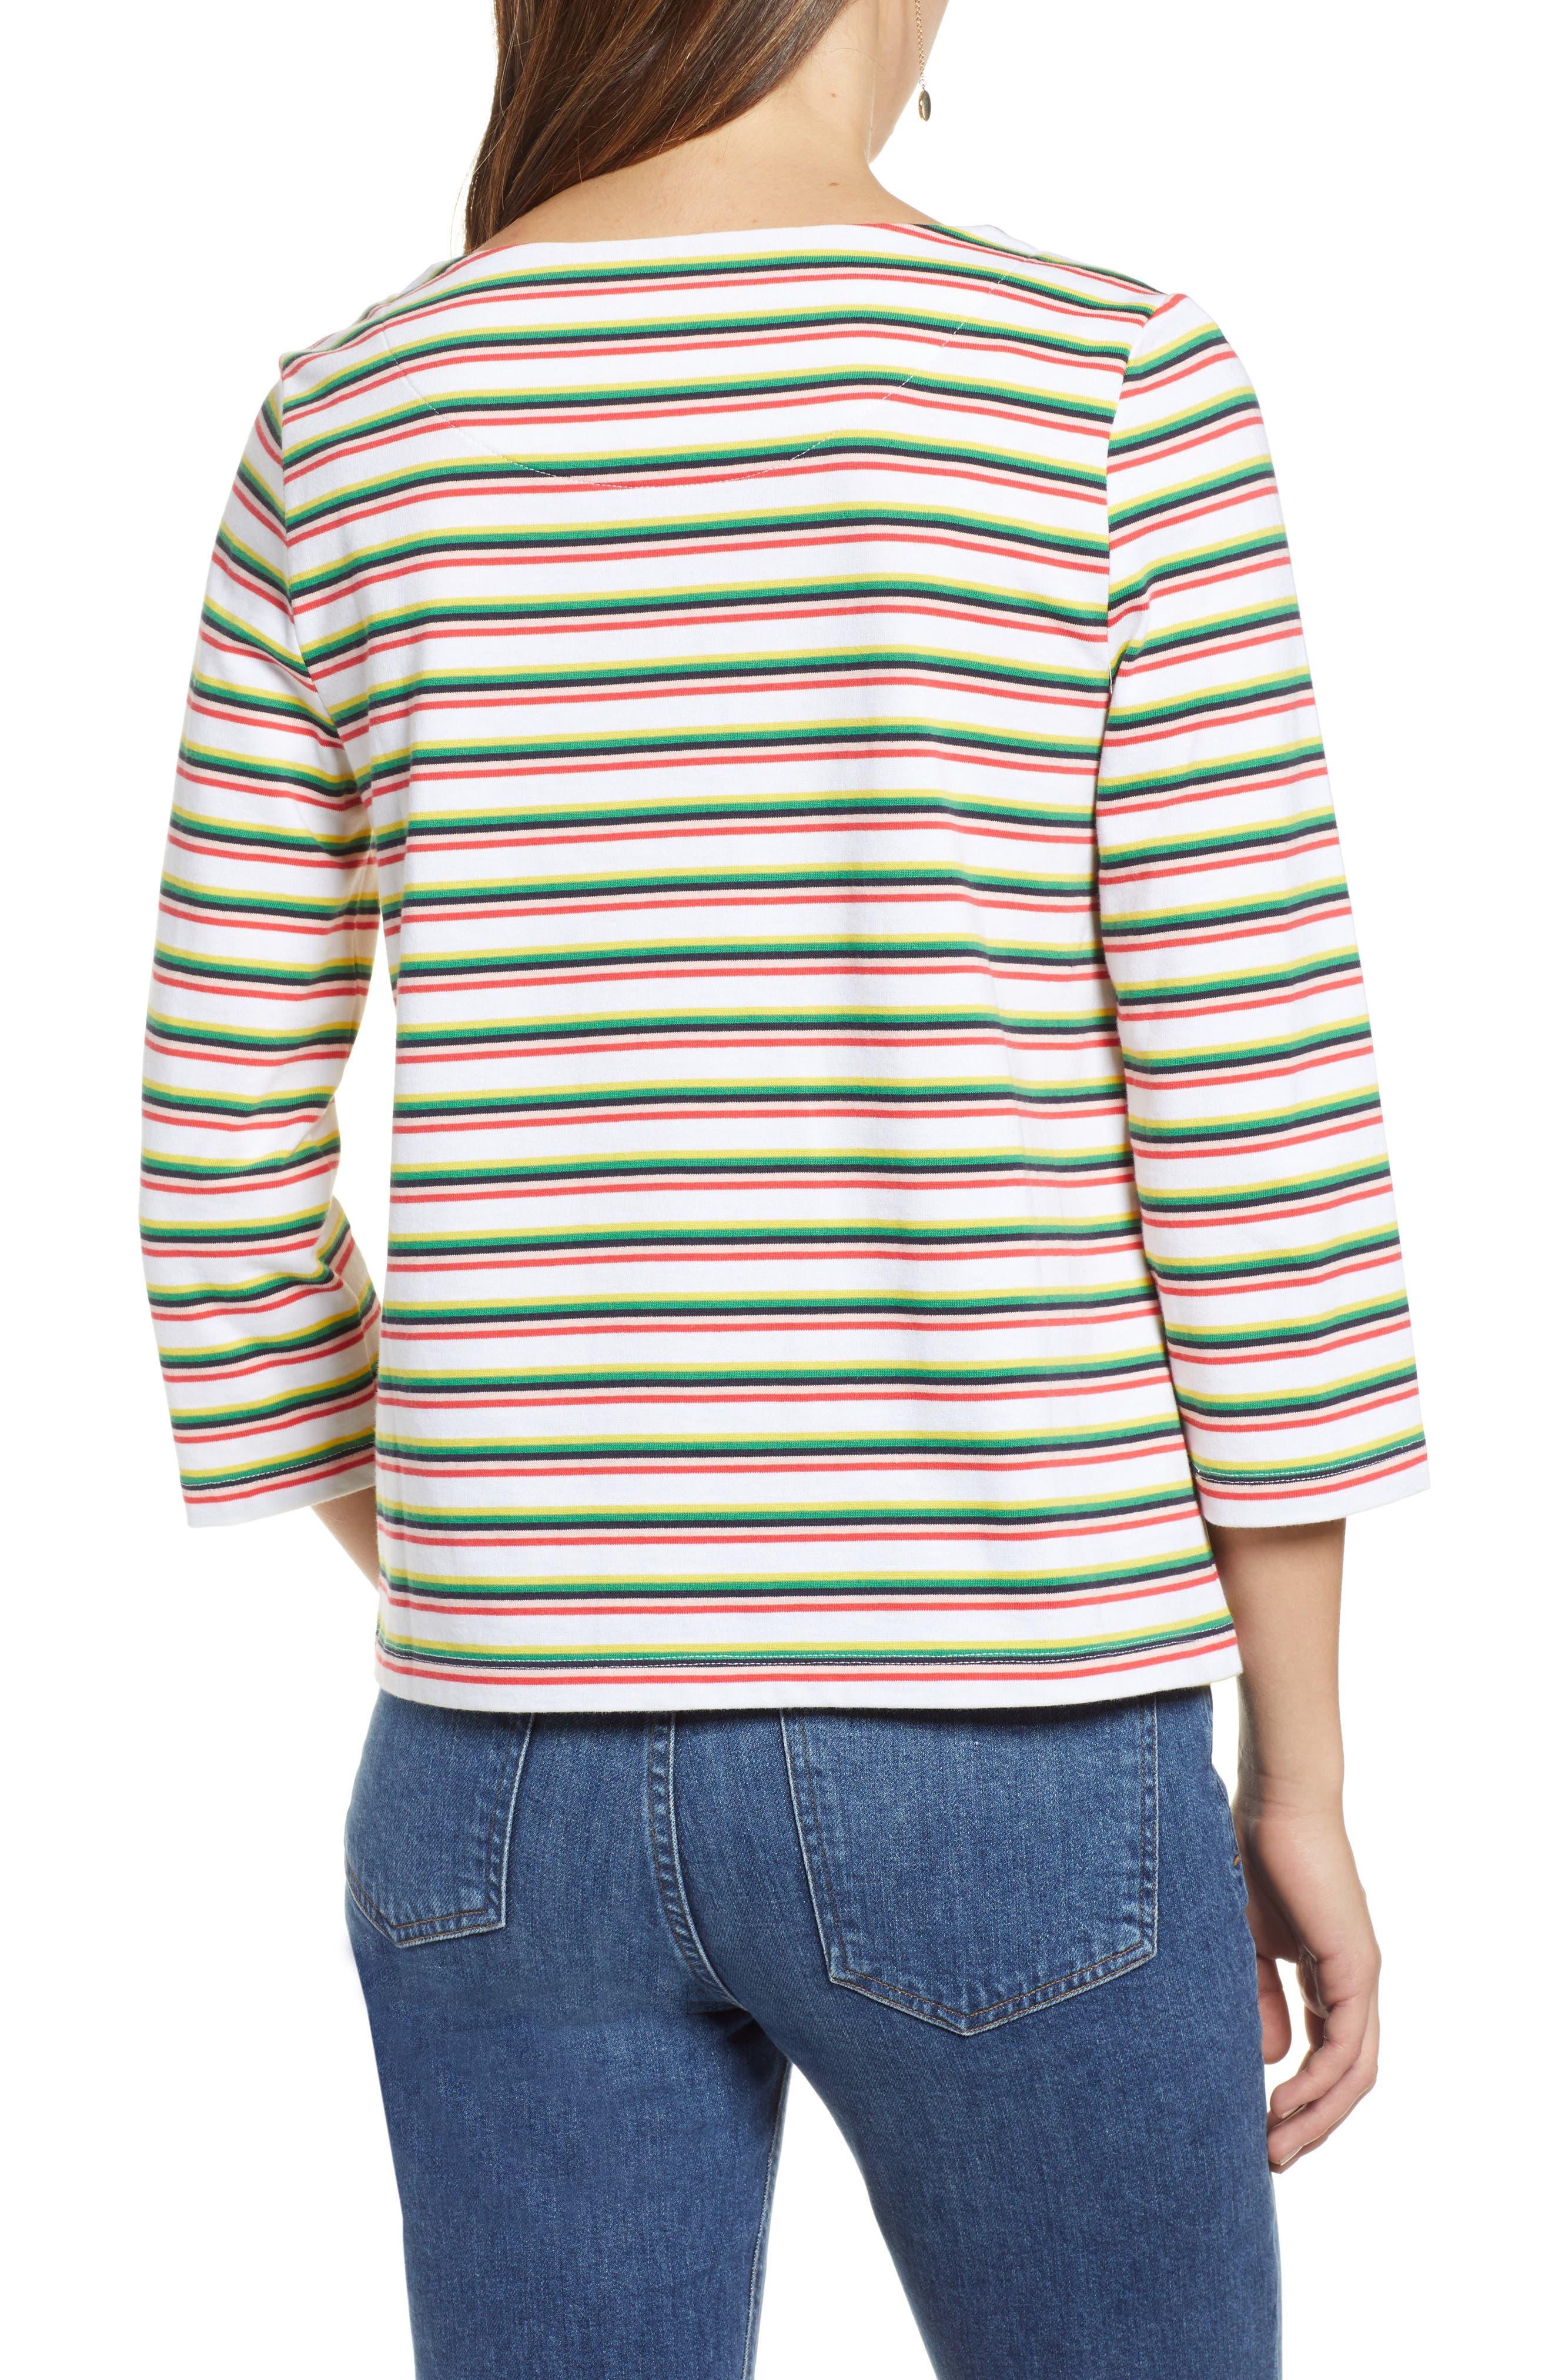 Stripe Top,                             Alternate thumbnail 2, color,                             WHITE MULTI PRIDE STRIPE